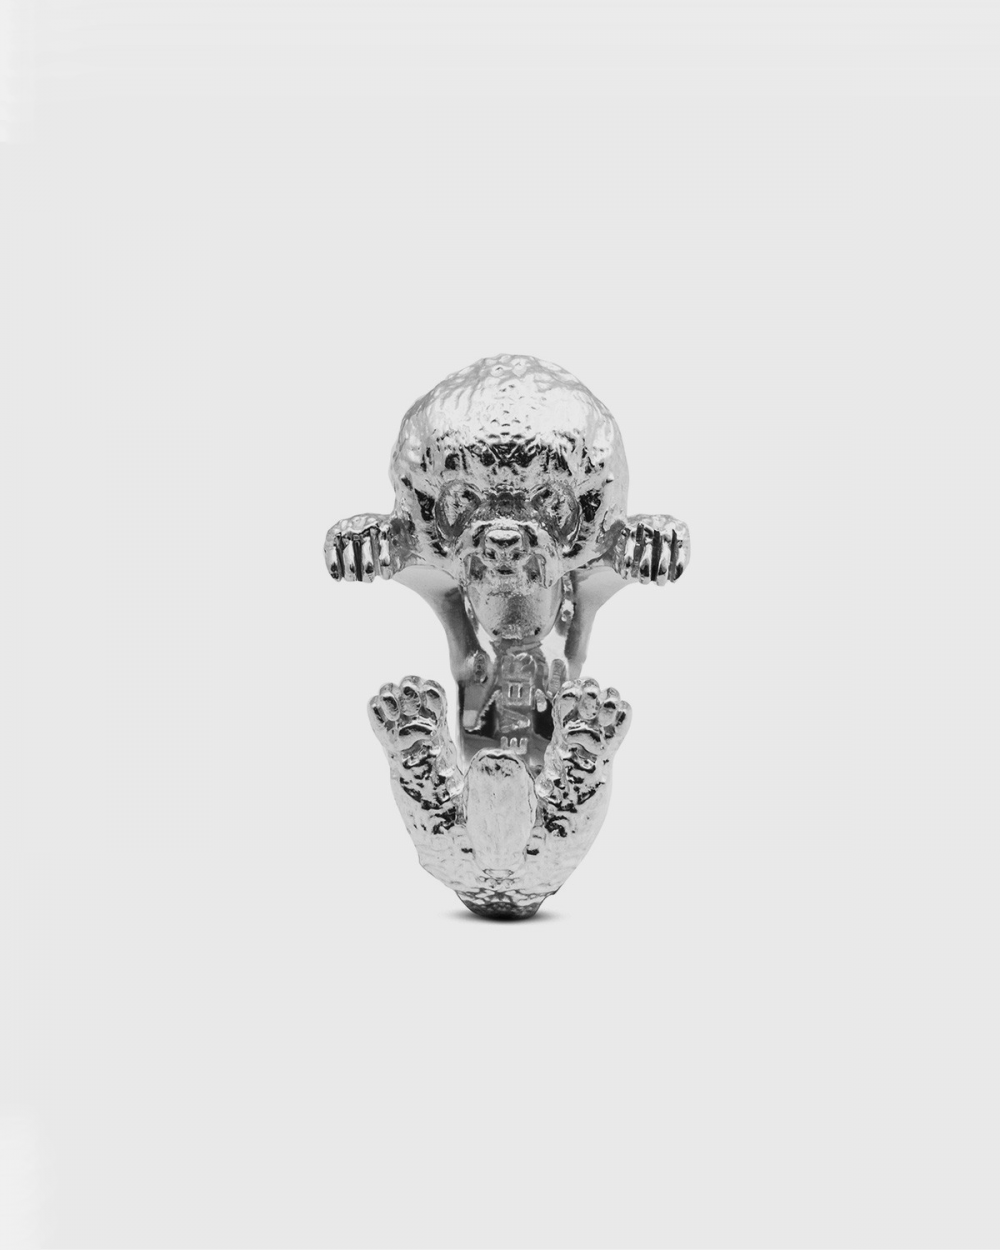 anello hug bichon frise argento lucido